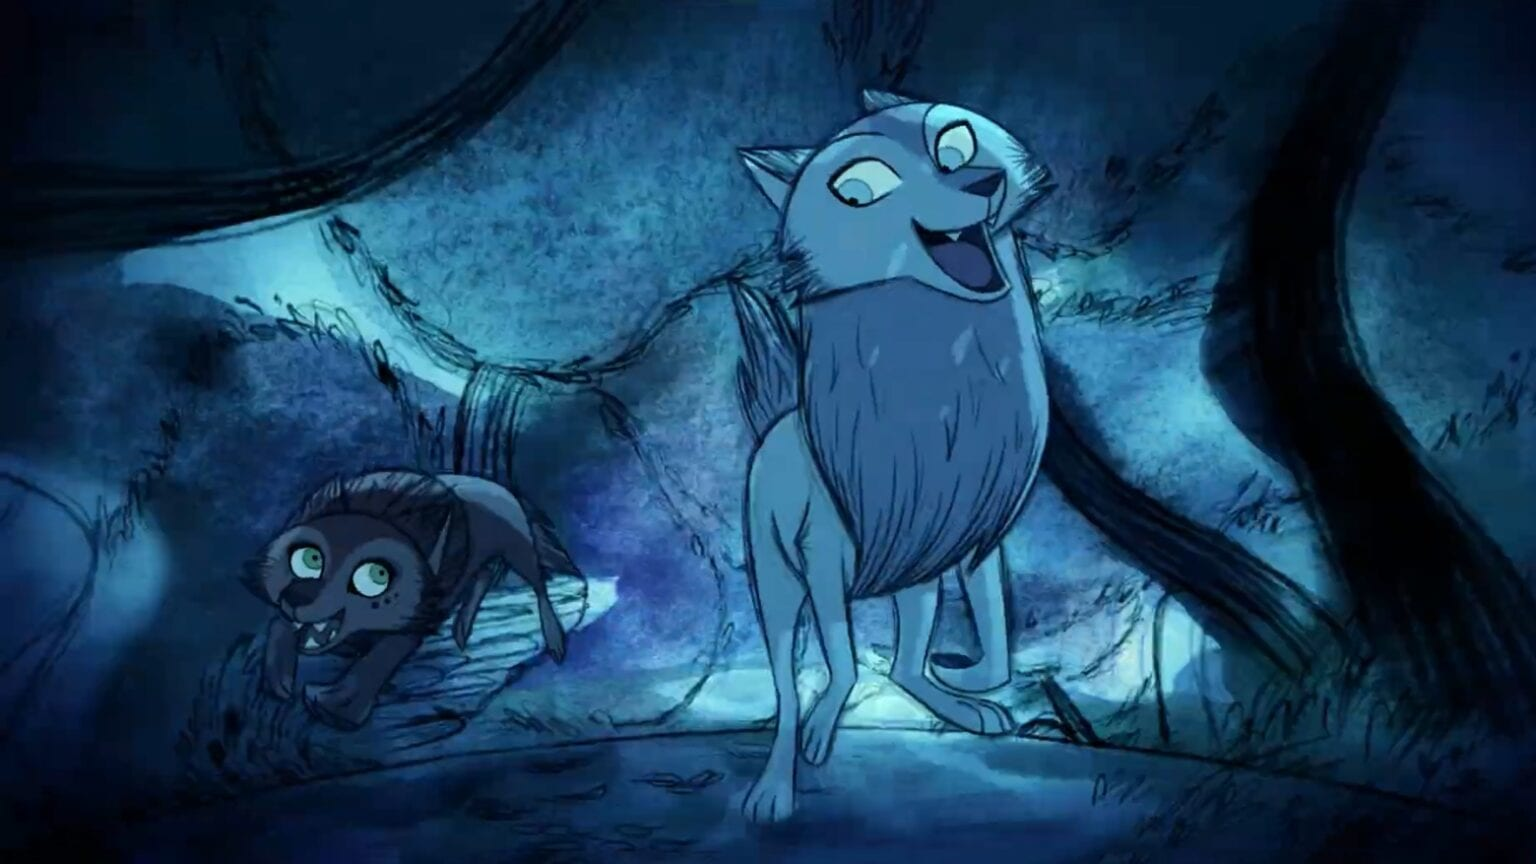 Wolfwalkers animated adventure strides onto Apple TV+ on December 11